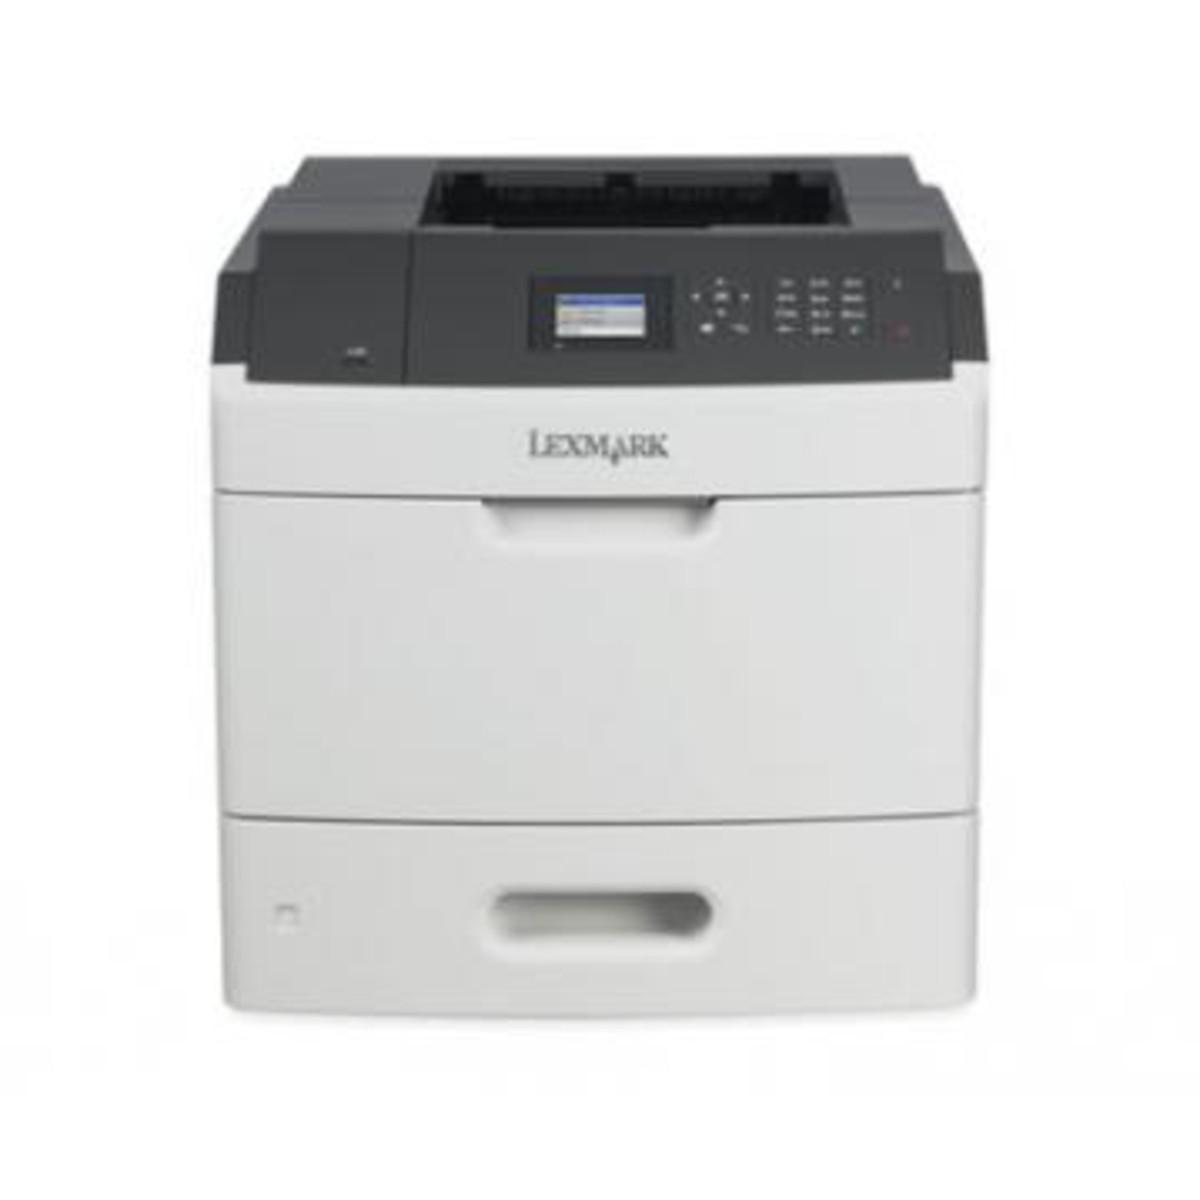 Lexmark MS810dn Laser Printer